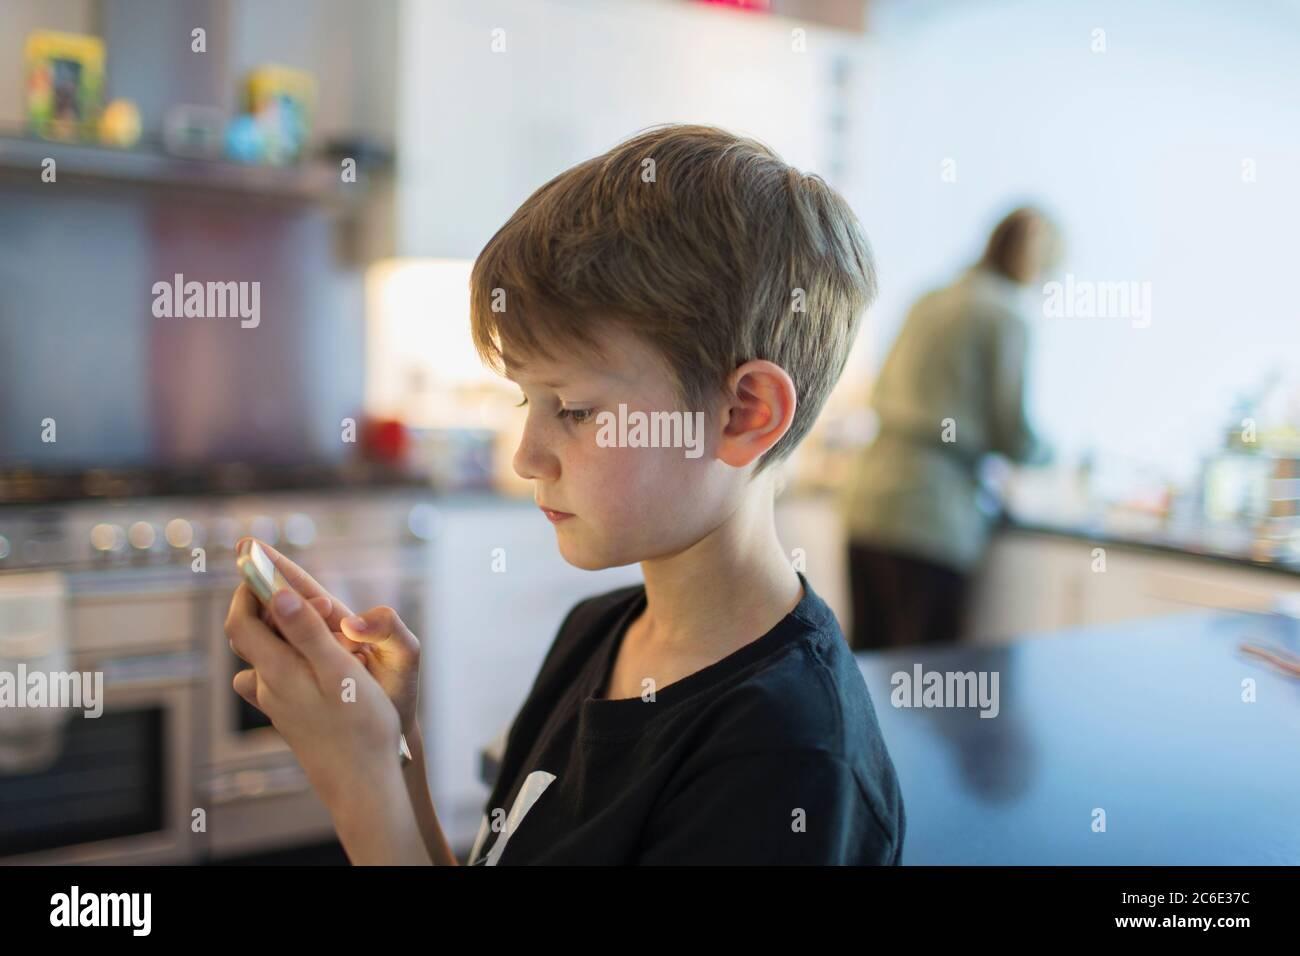 Boy using smart phone in kitchen Stock Photo